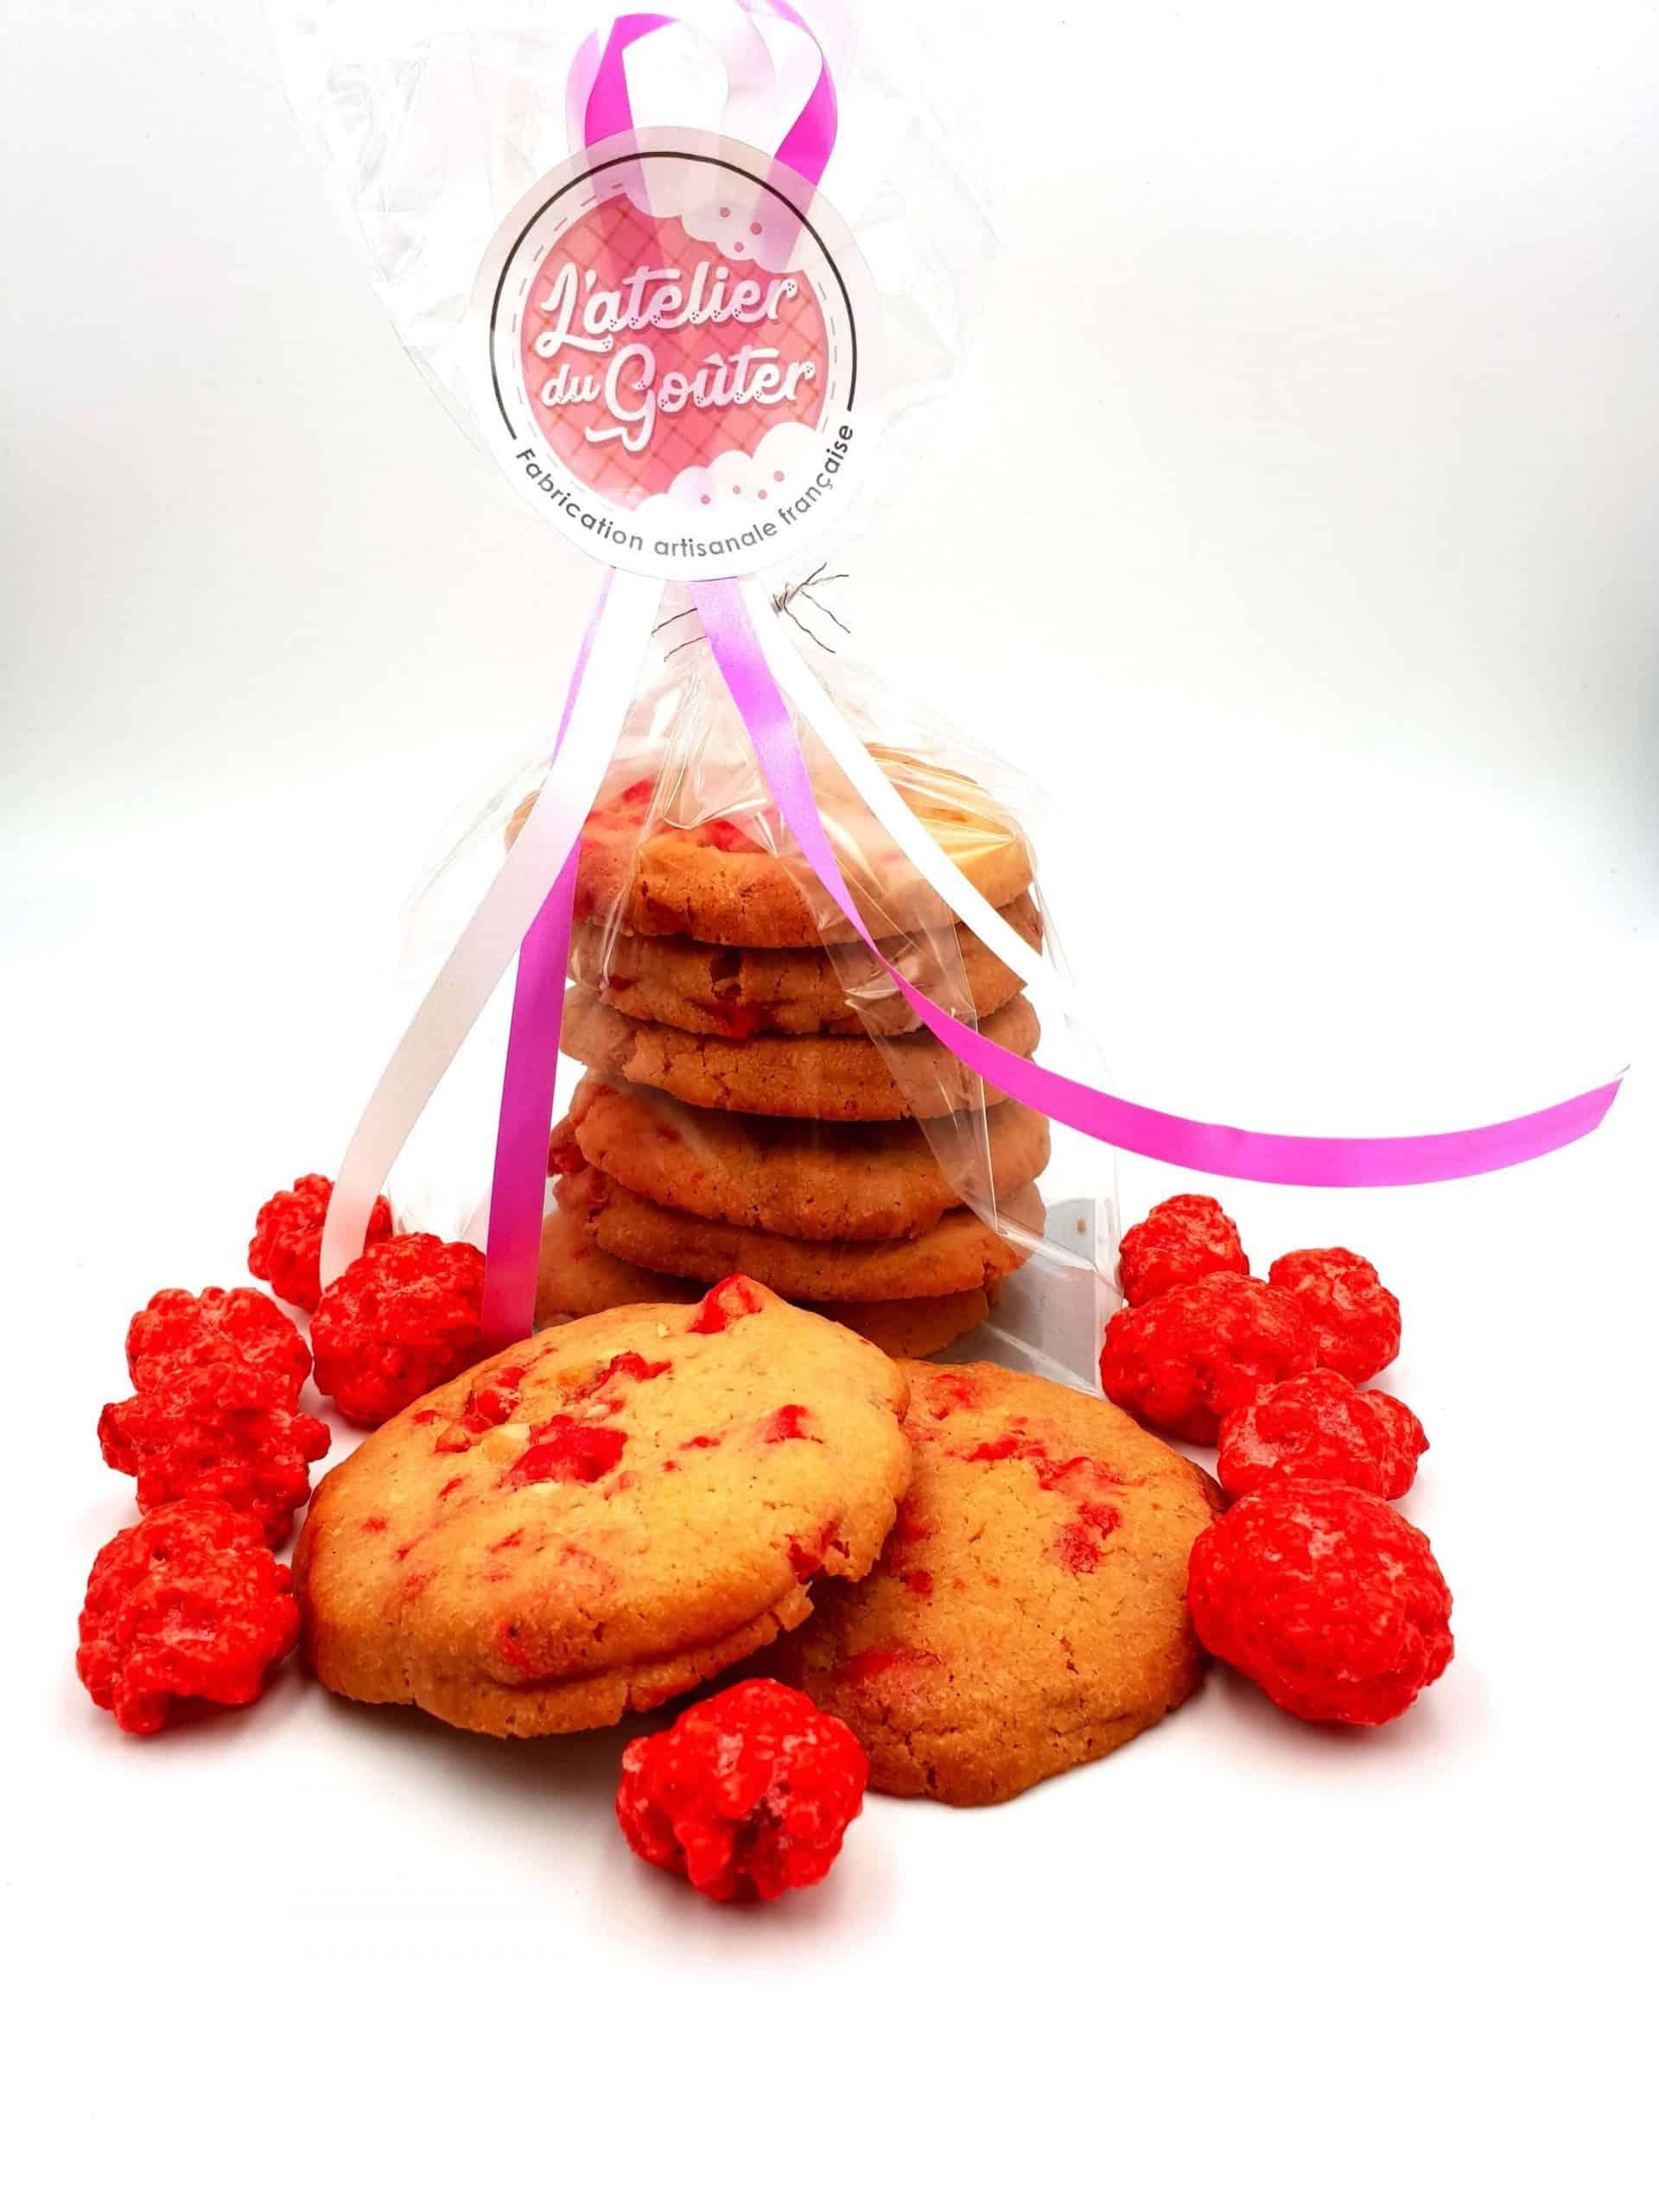 Cookies praline